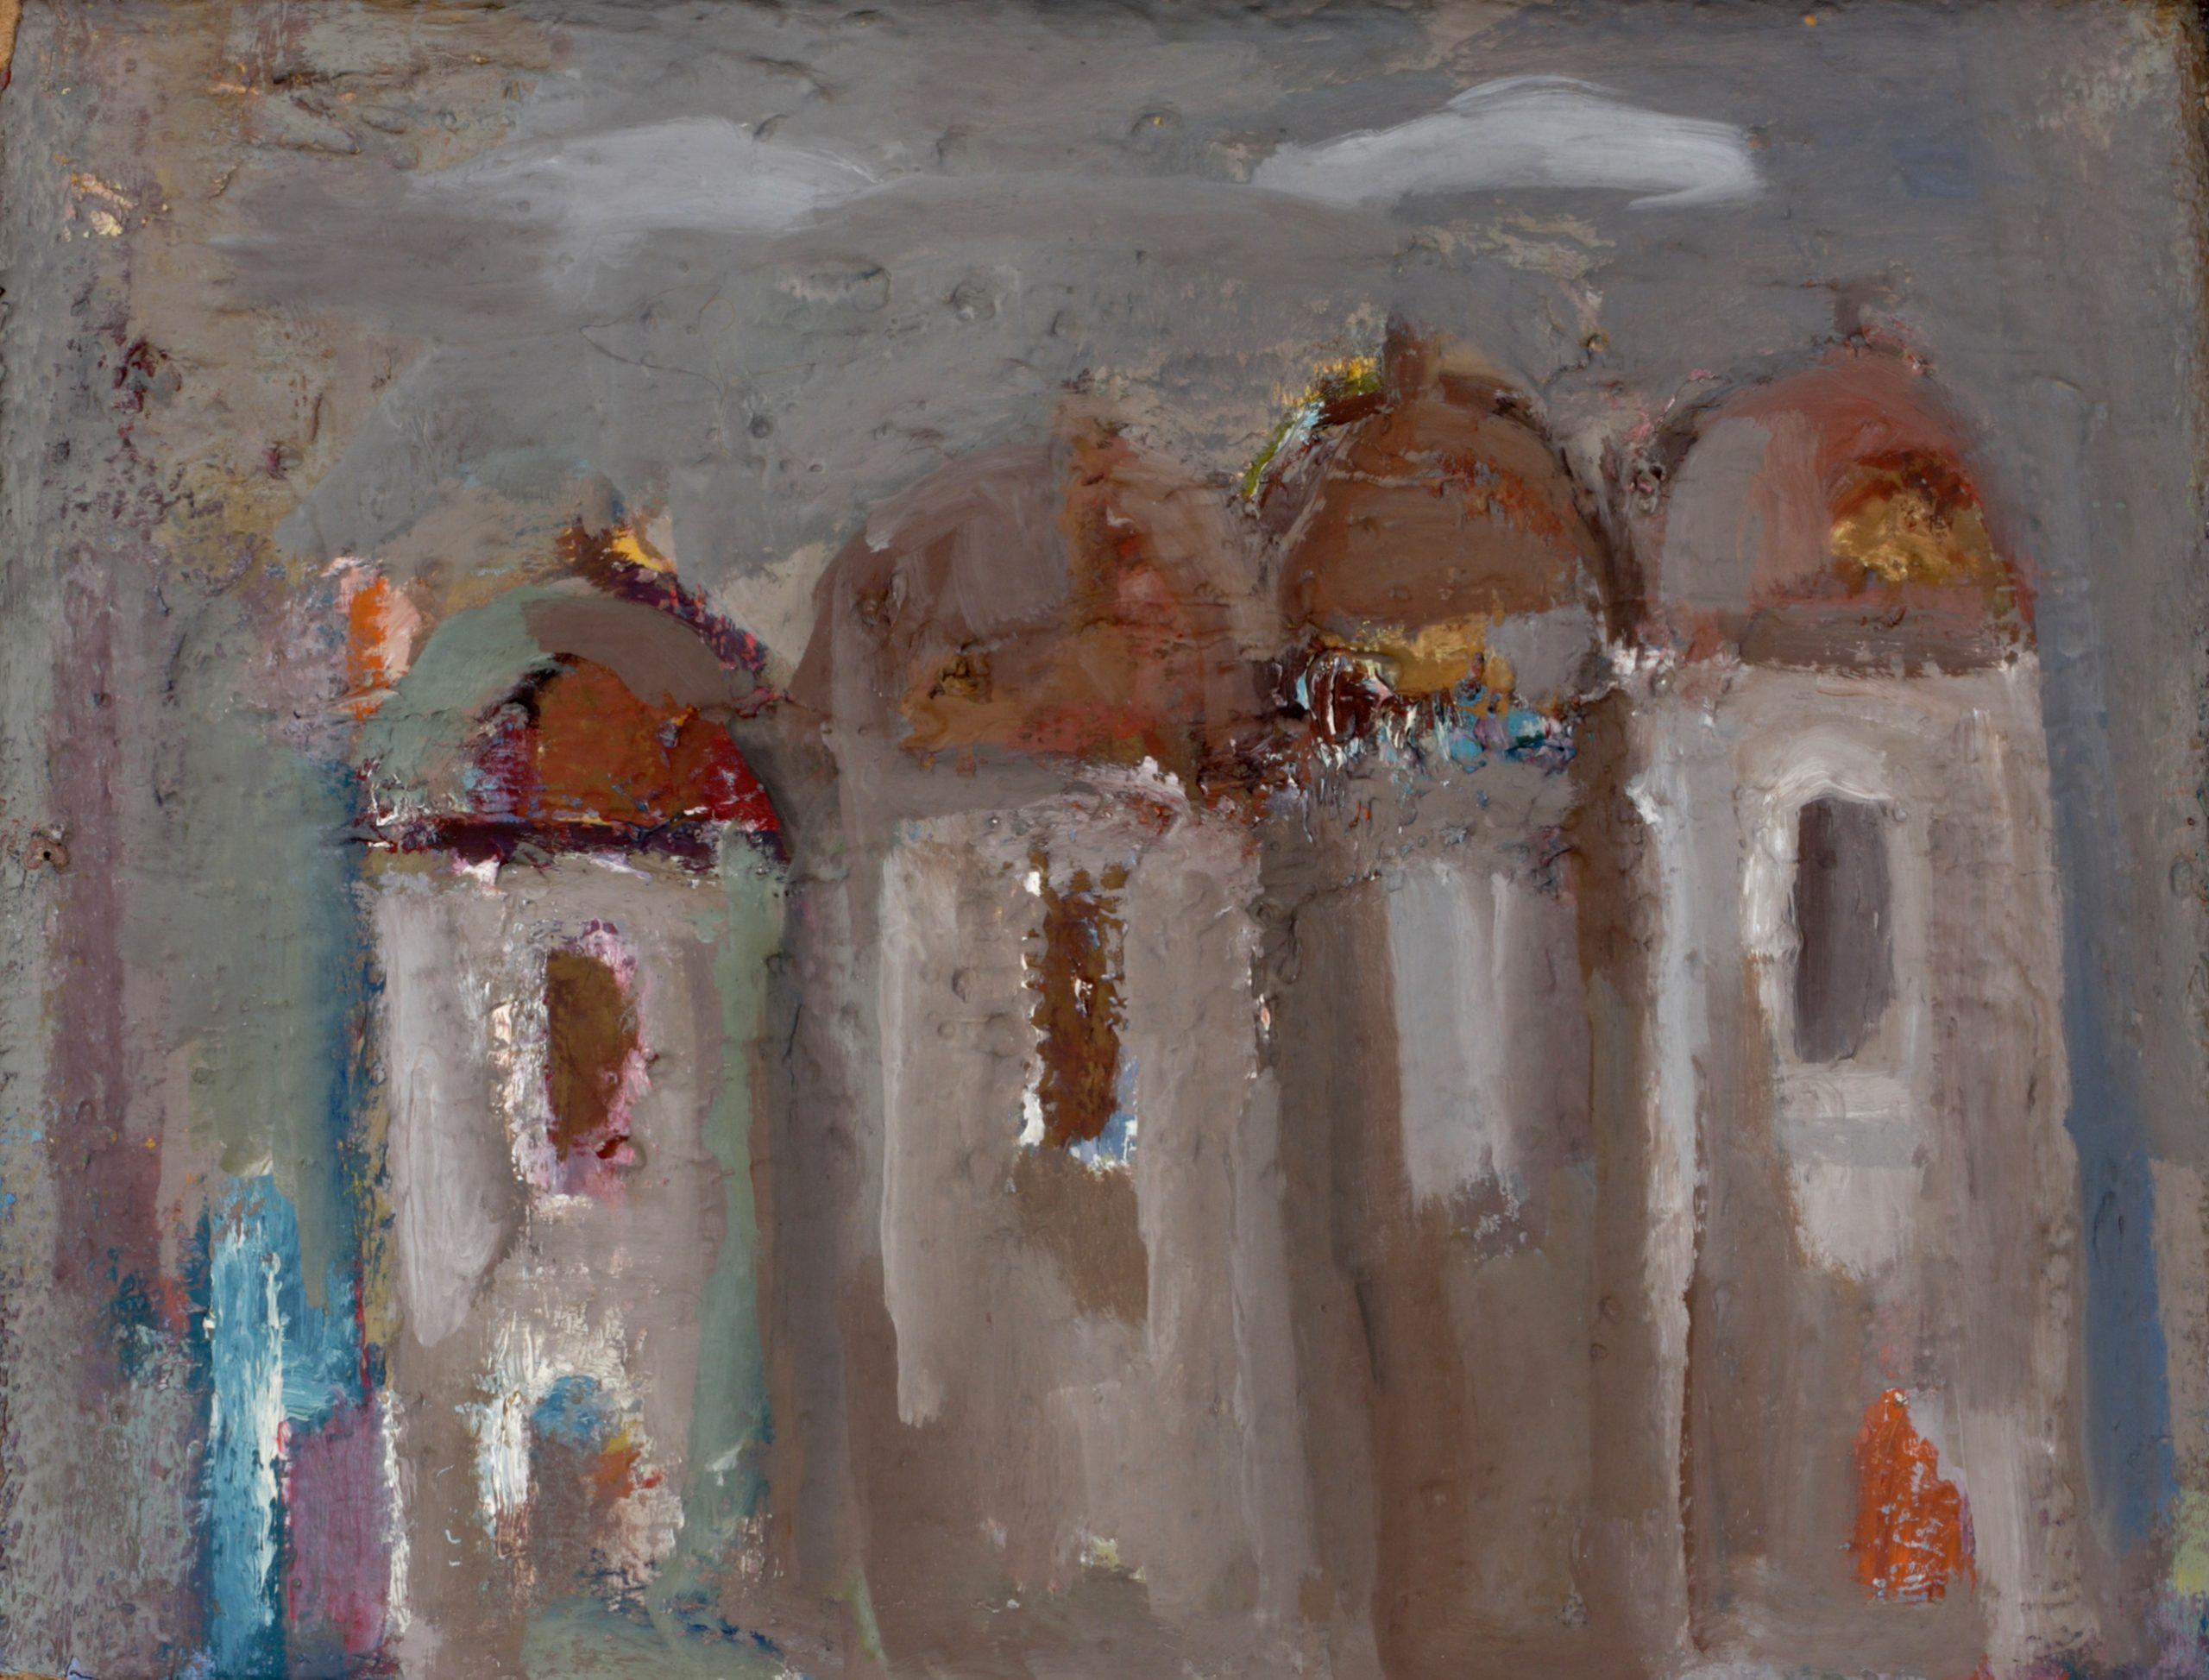 Пейзаж 'Къщи' от Олга Белопитова